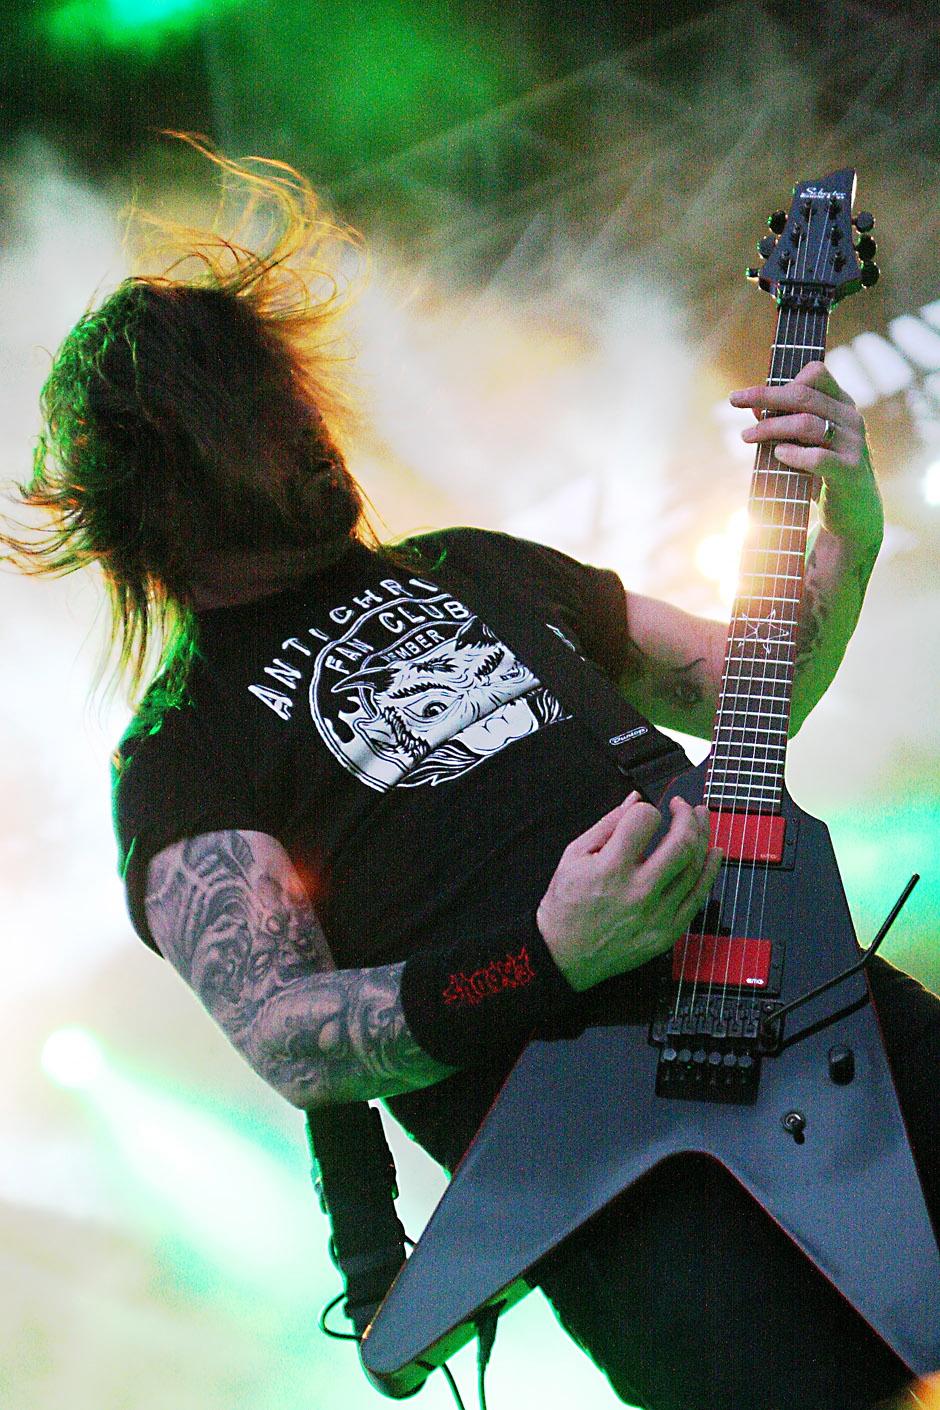 Slayer am Vainstream 2012